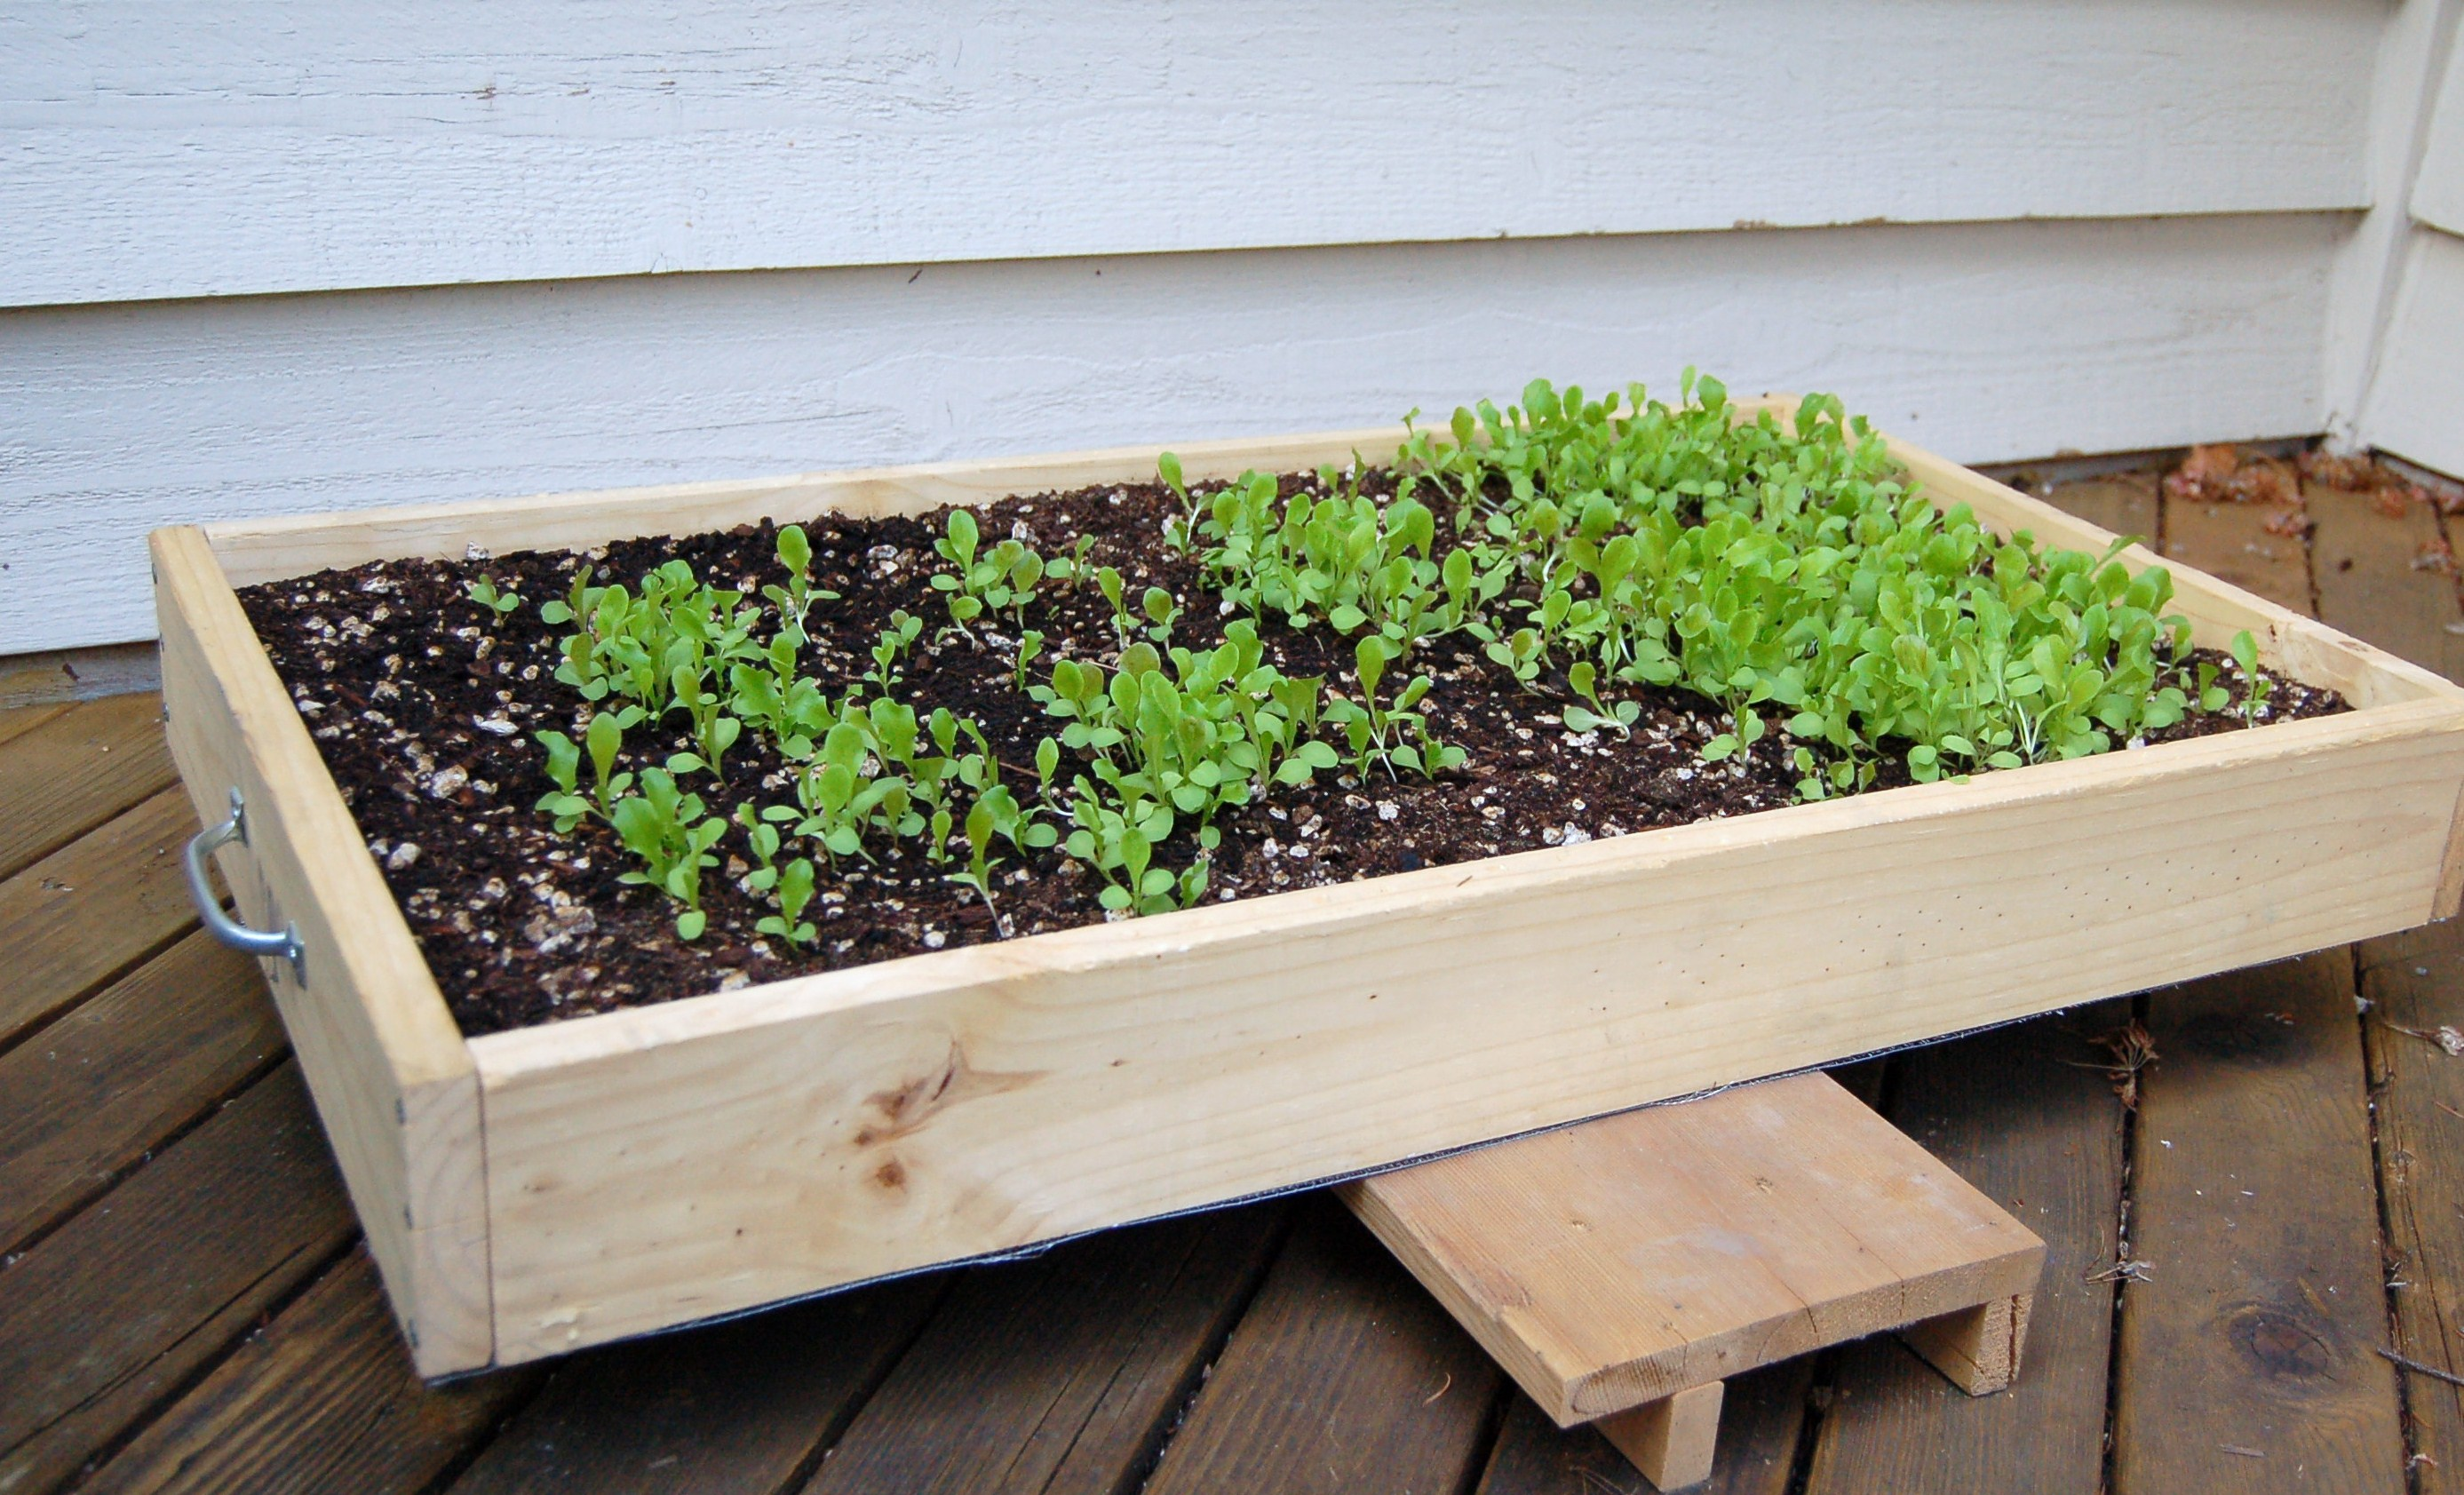 Salad box concept from Organic Gardening magazine